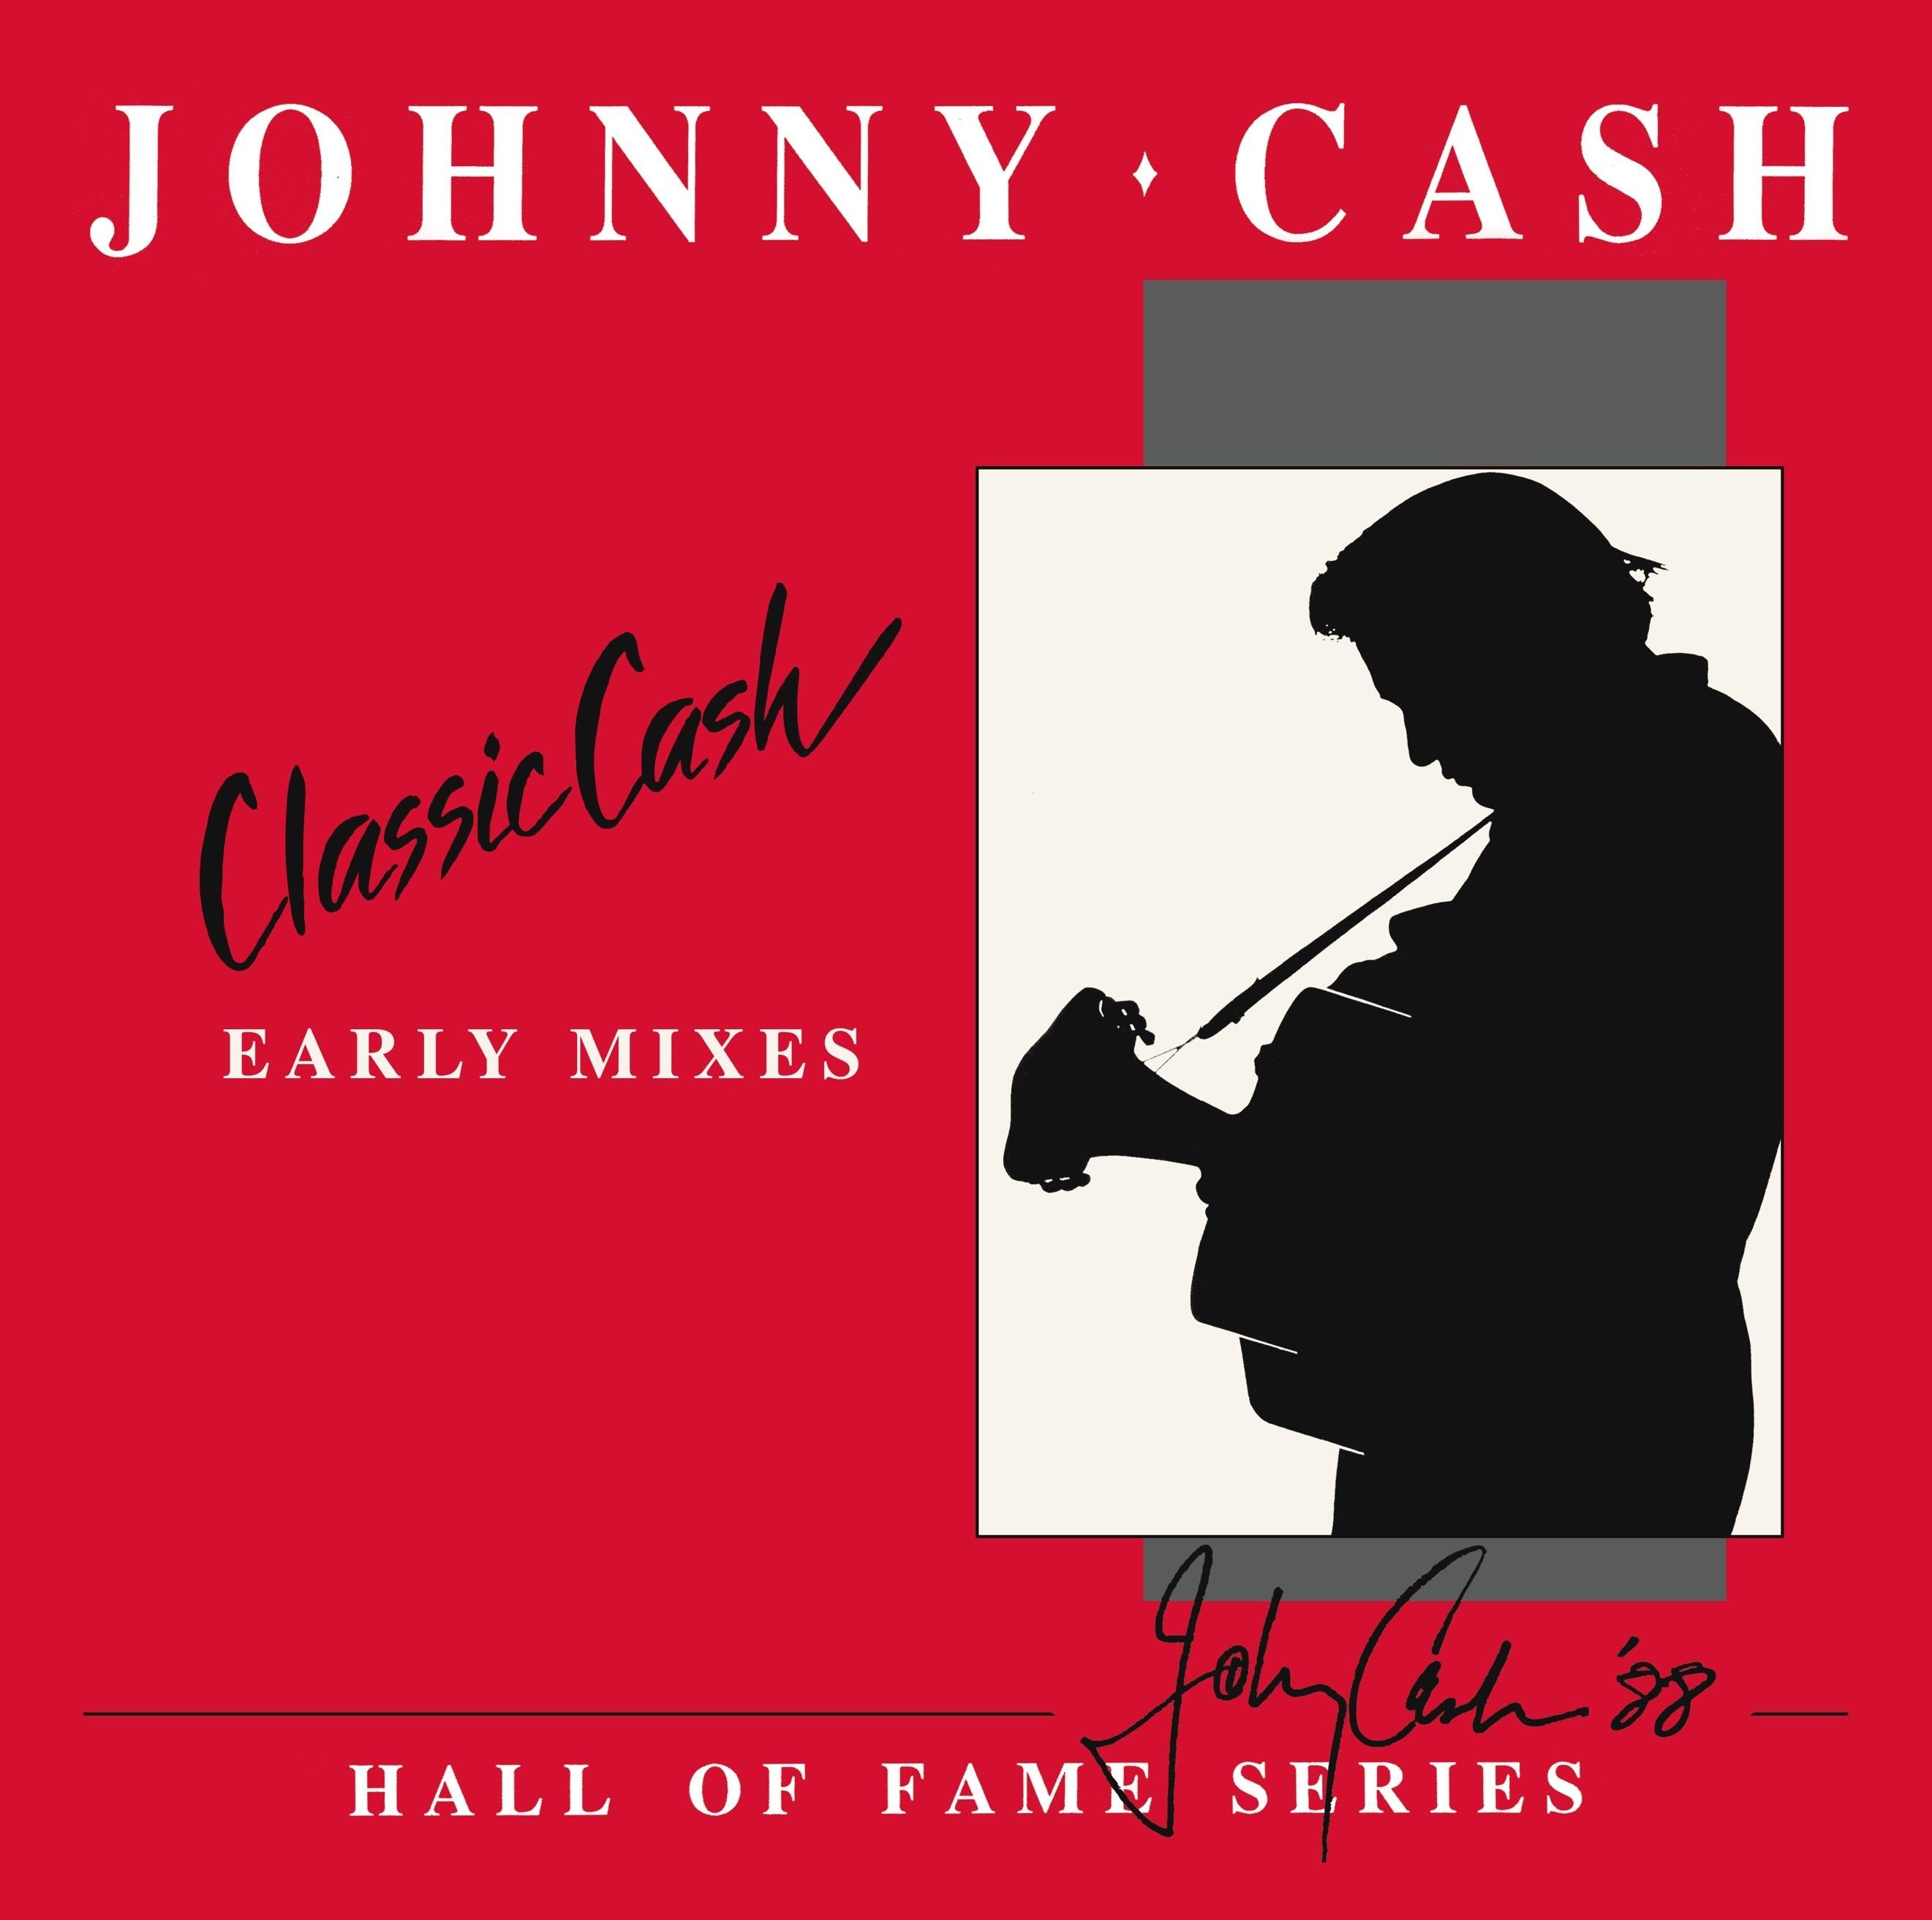 Johnny Cash - Classic Cash: Early Mixes